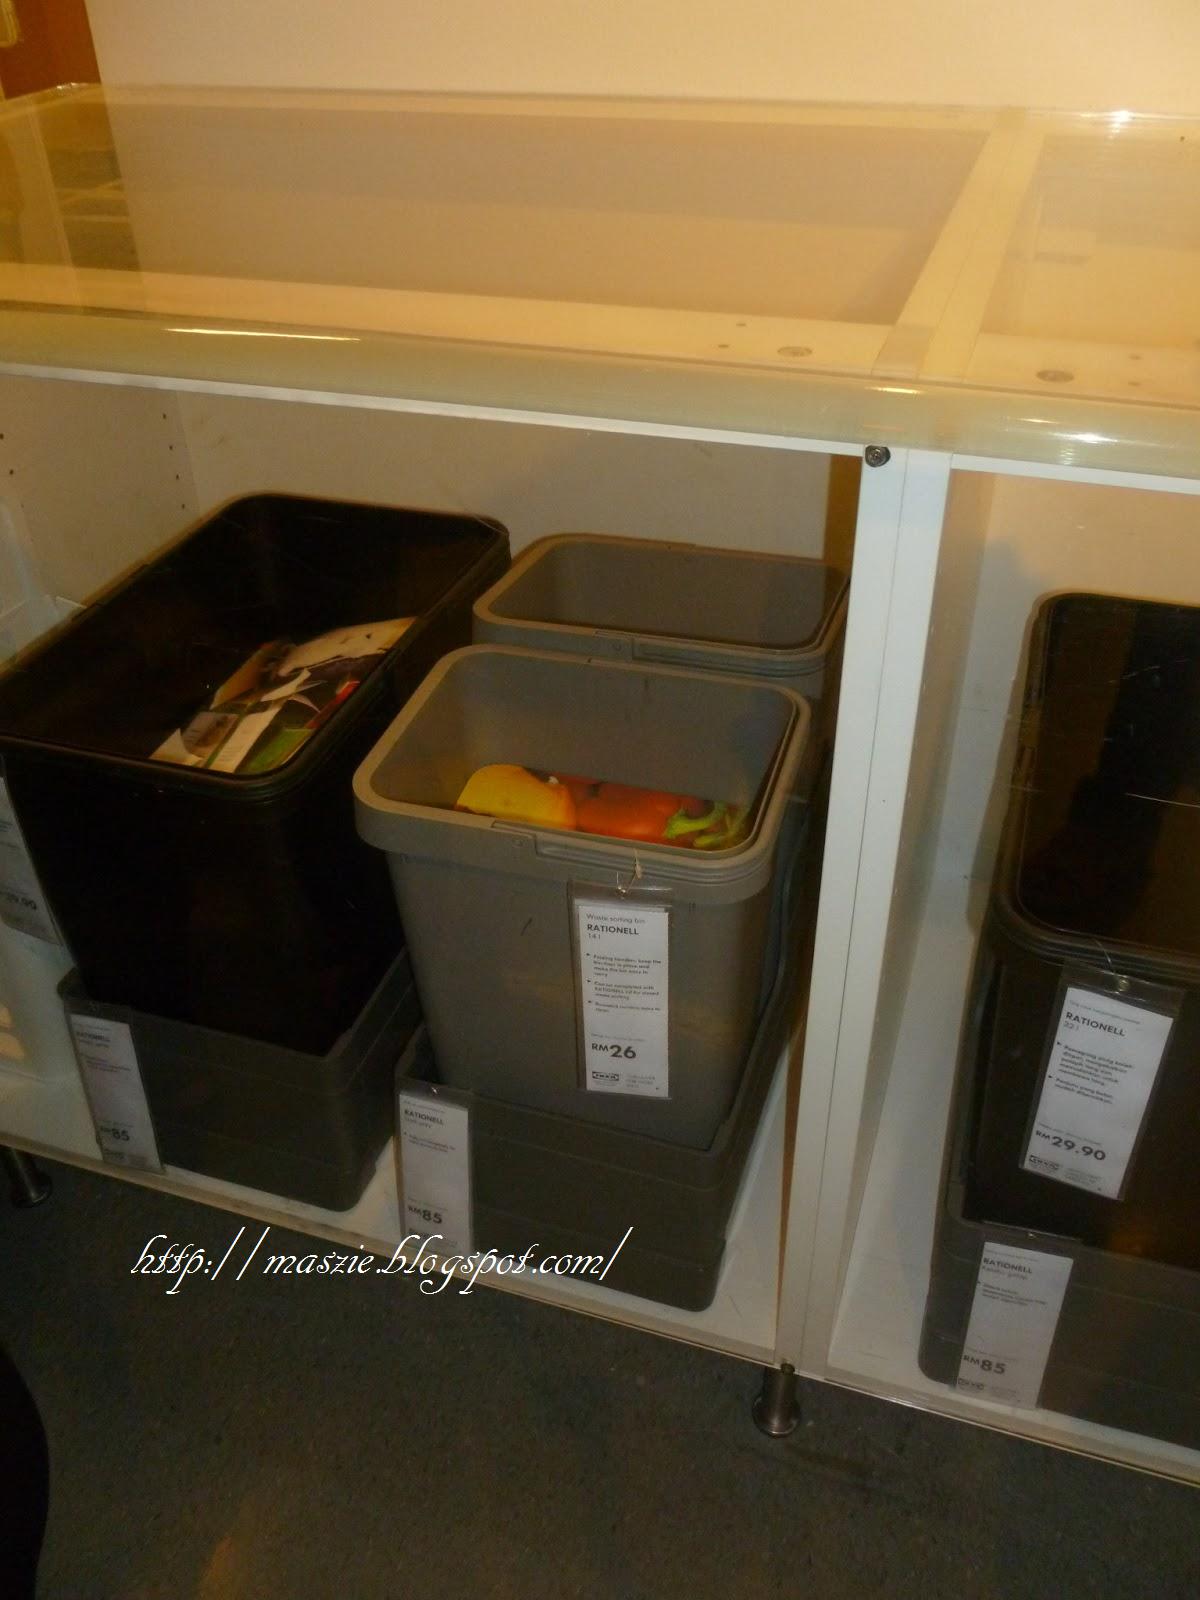 Lokasi Tong Sampah Haruslah Di Tempat2 Yang Strategik Dan Tidak Mengganggu Pandangan Mata Misalnya Belakang Pintu Bilik Bawah Sinki Dapur